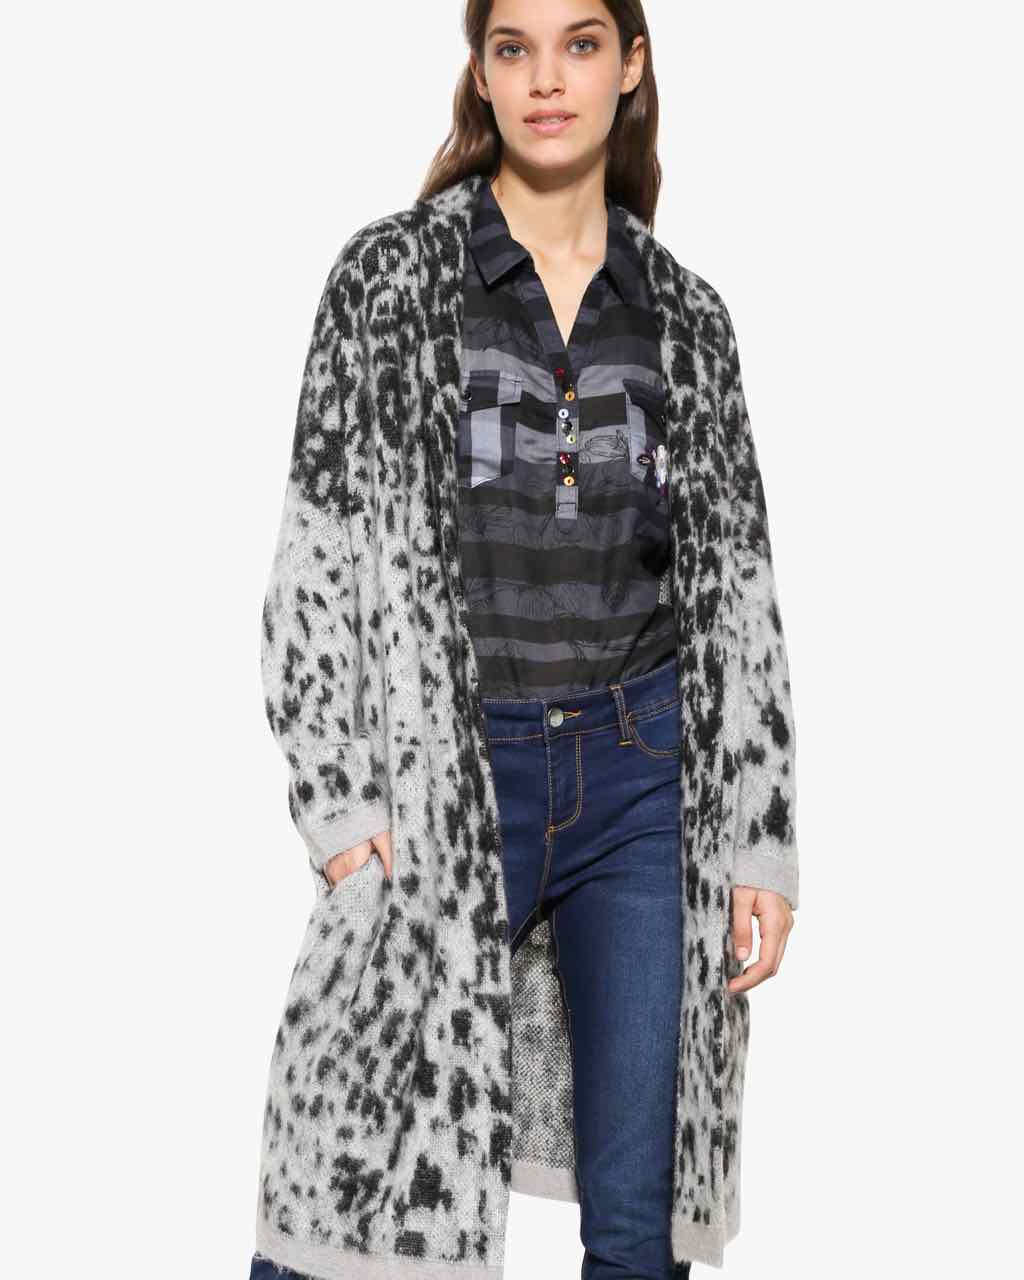 17WWJFC4_2023 Desigual Cardigan Jacket Grey Leopard Buy Online